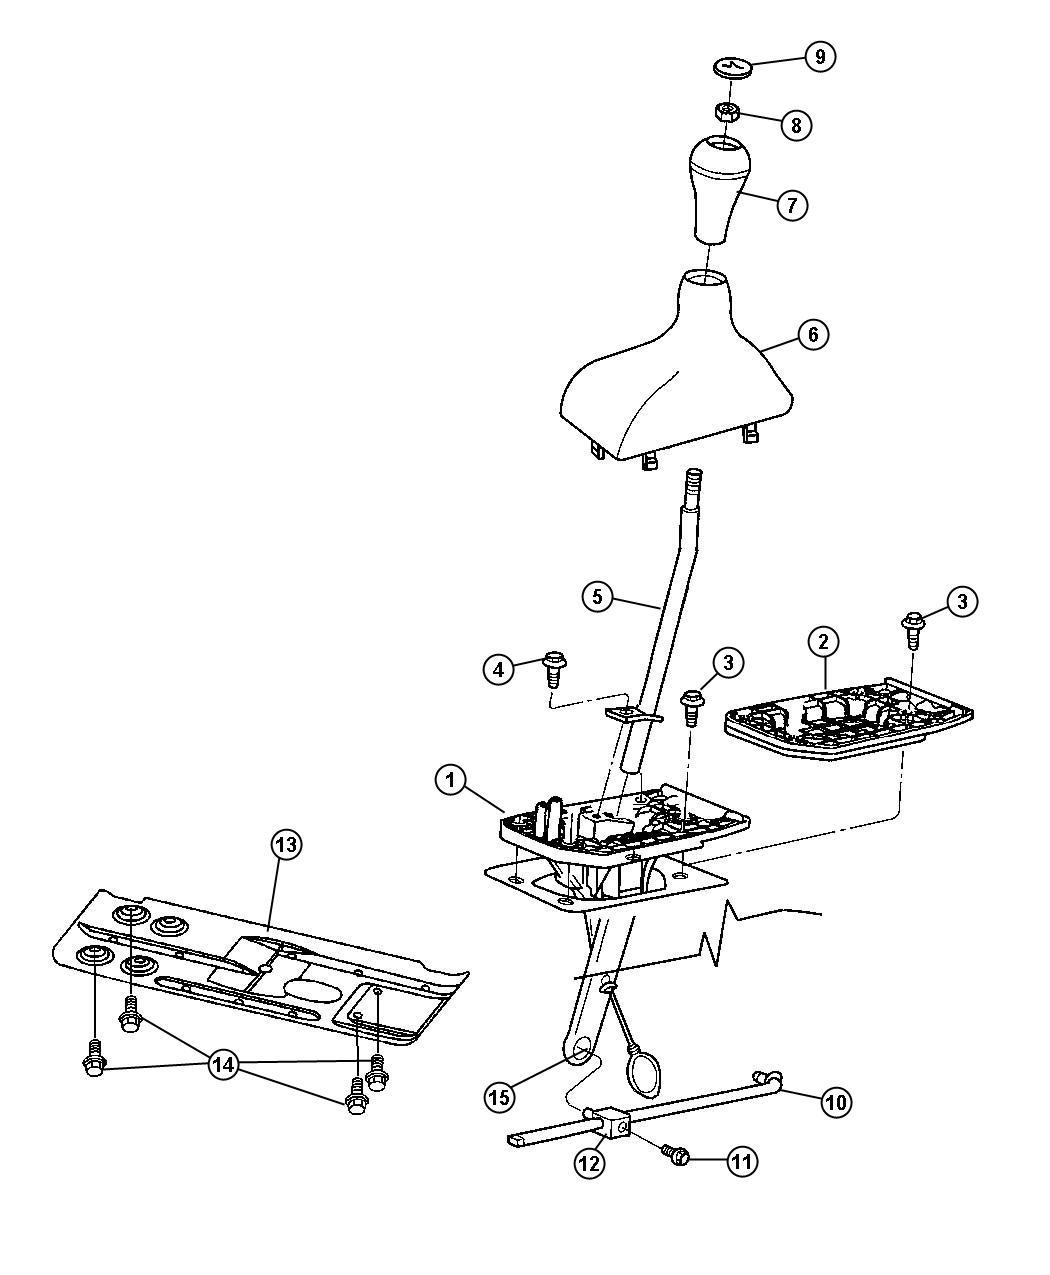 Dodge Ram Rod Gear Shift Control Transfer Case